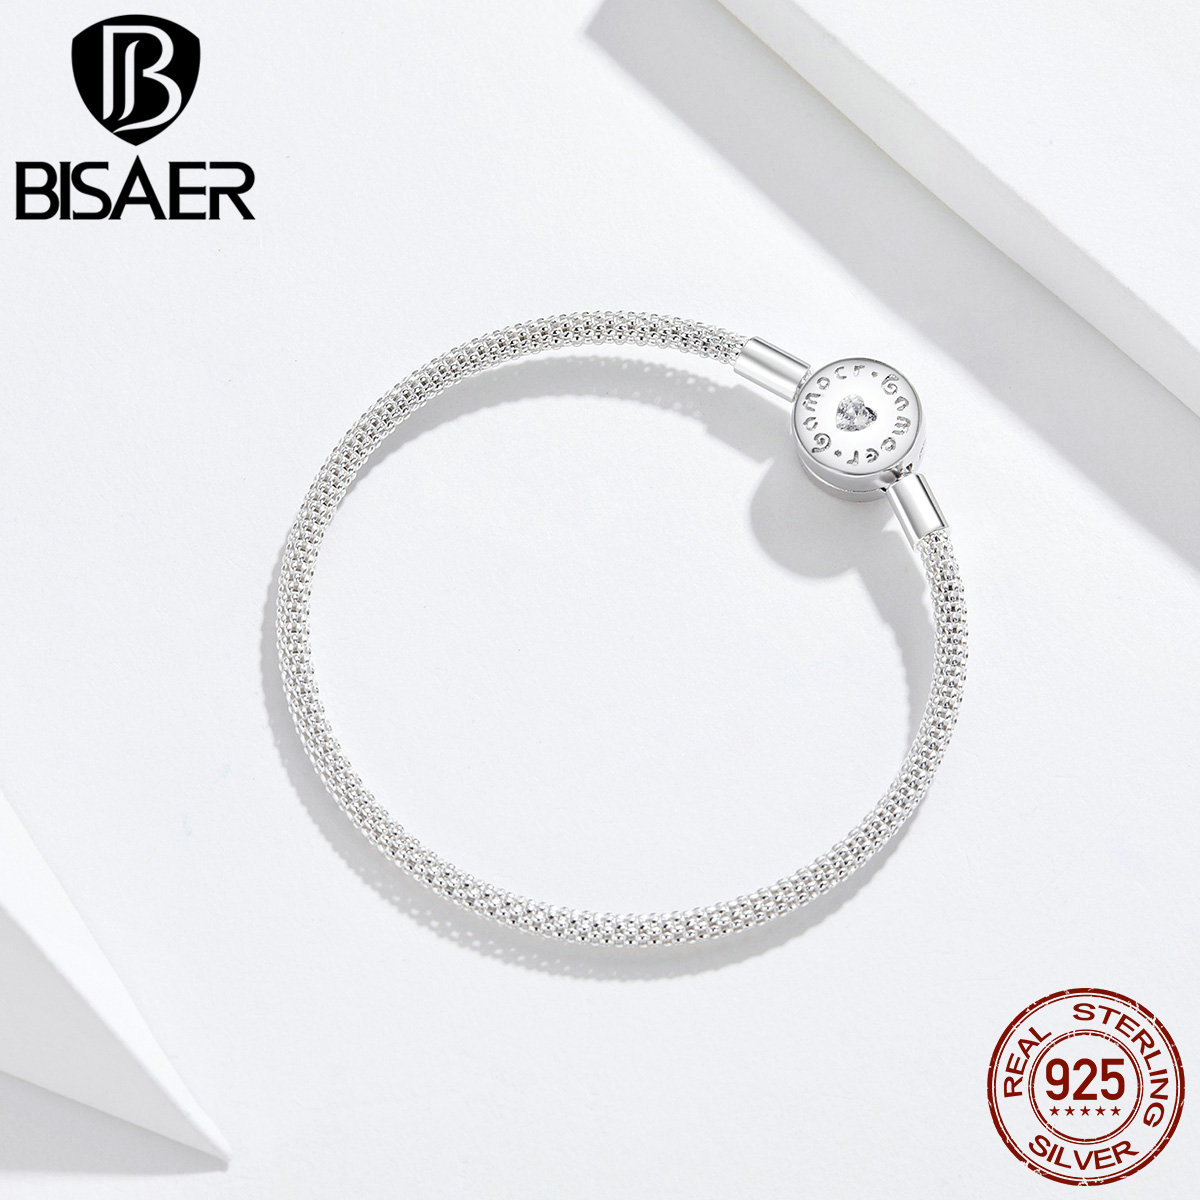 BISAER 925 Sterling Silver Women Bracelets Round Clasp Love Pave Snake Chain Bracelets Sterling Silver Jewelry EFB014